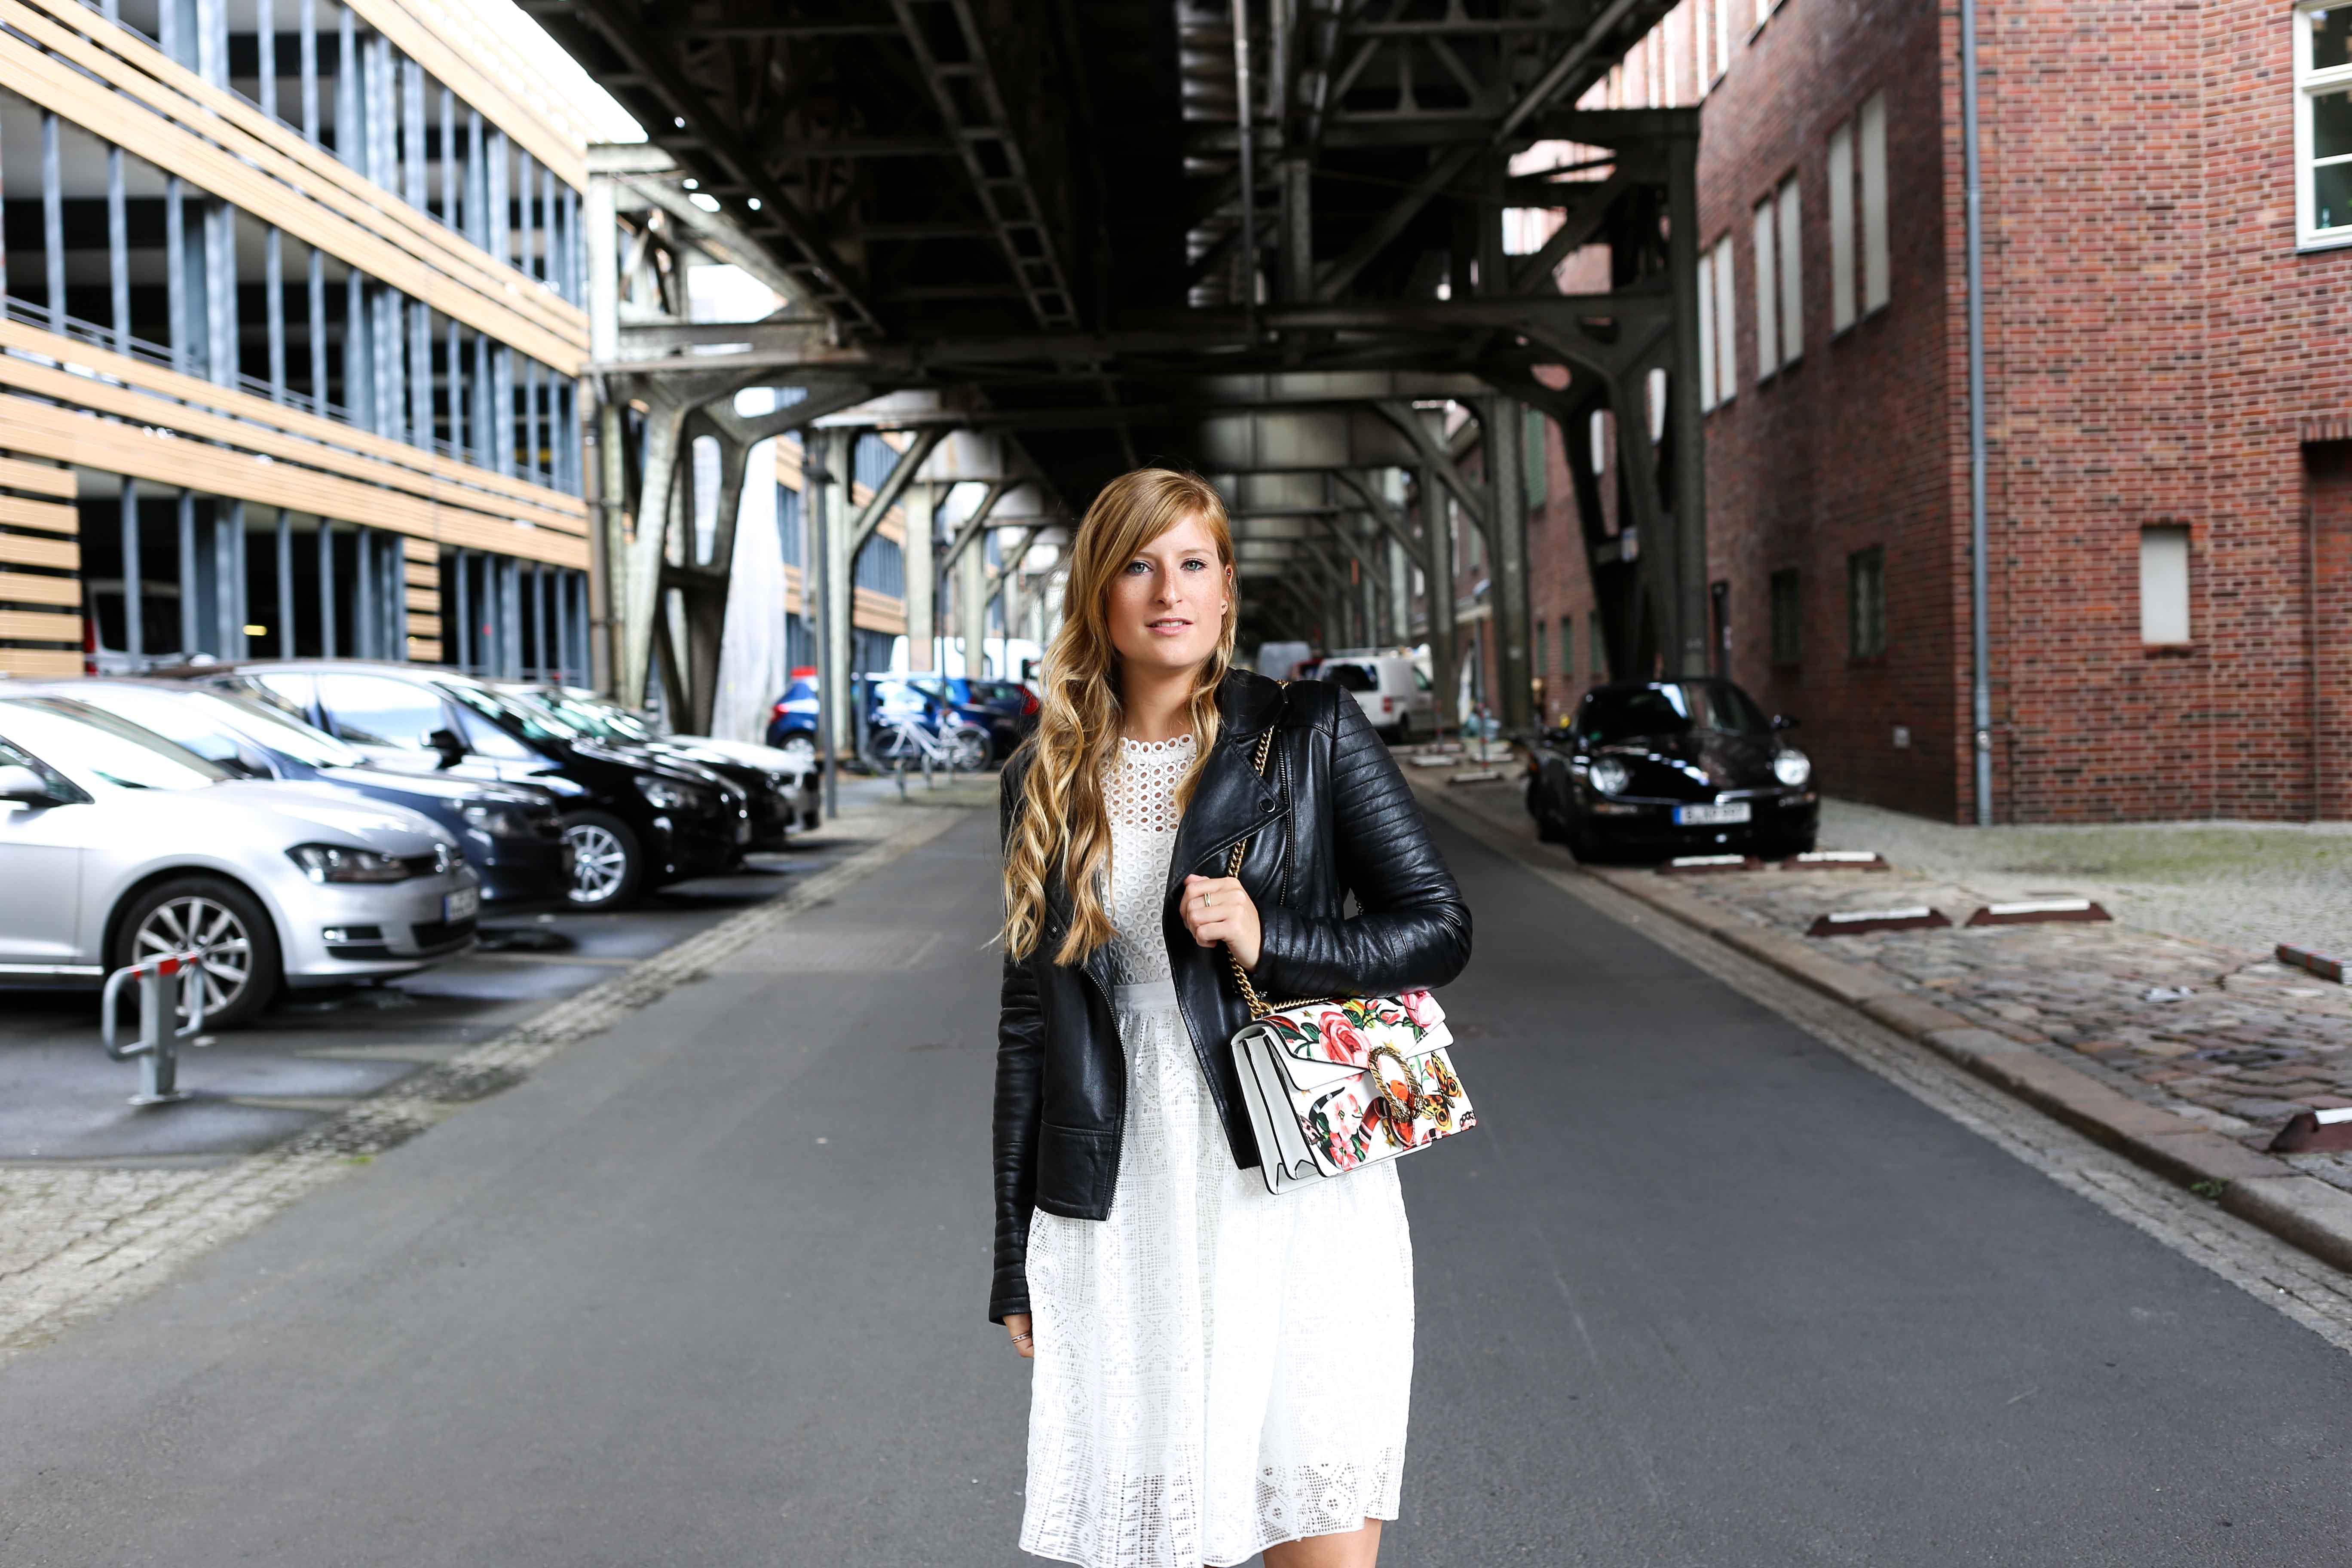 Fashion Week Outfit streetstyle weißes Spitzenkleid Asos kombinieren Lederjacke Modeblog Deutschland Fashion Blogger OOTD 7